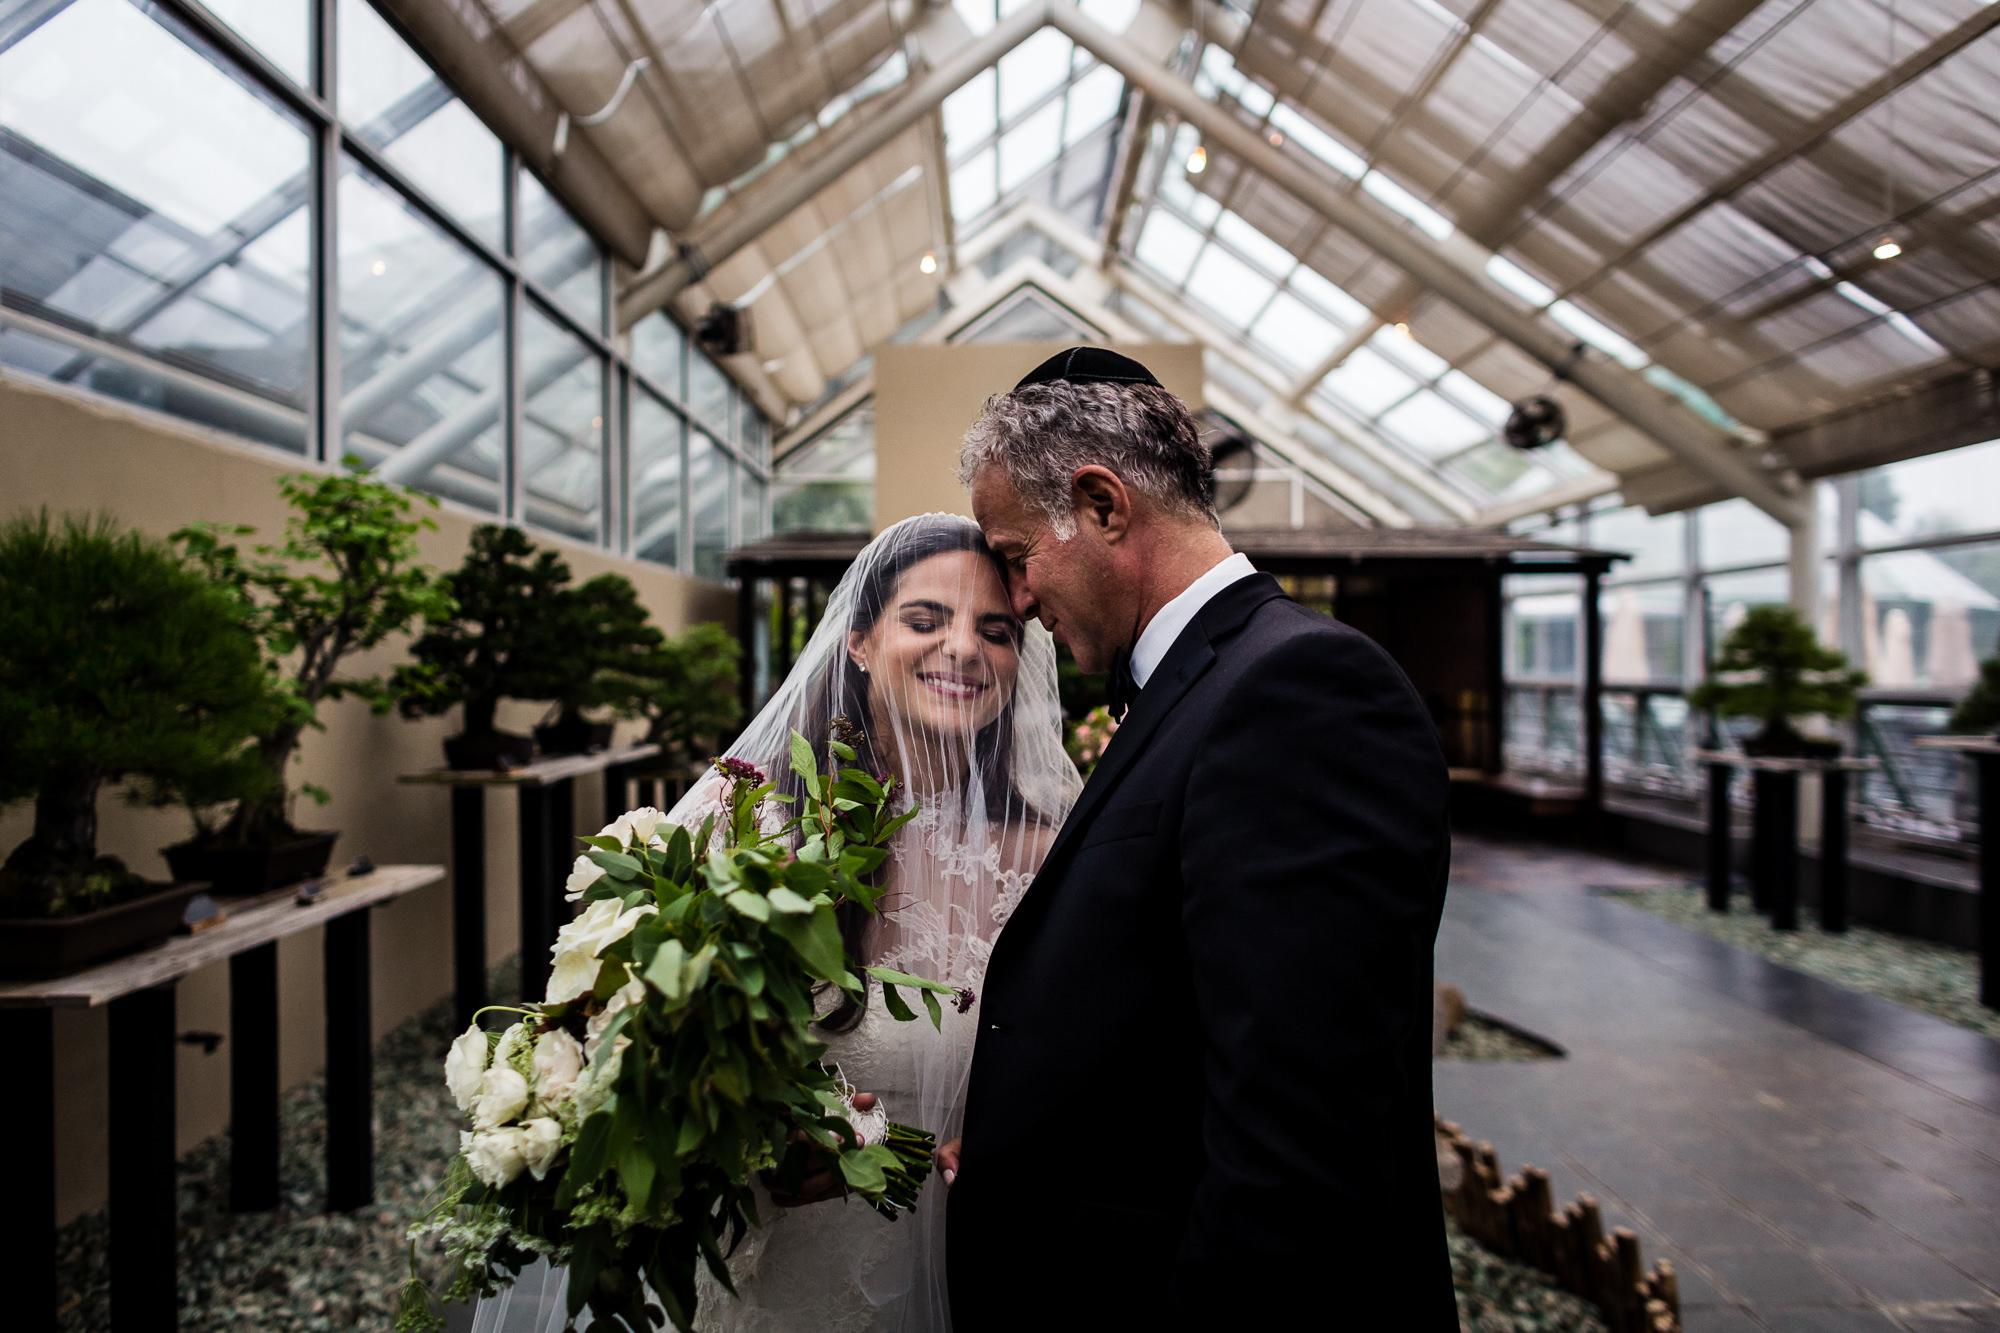 Dad embracing bride in long veil - photo by JAG Studios